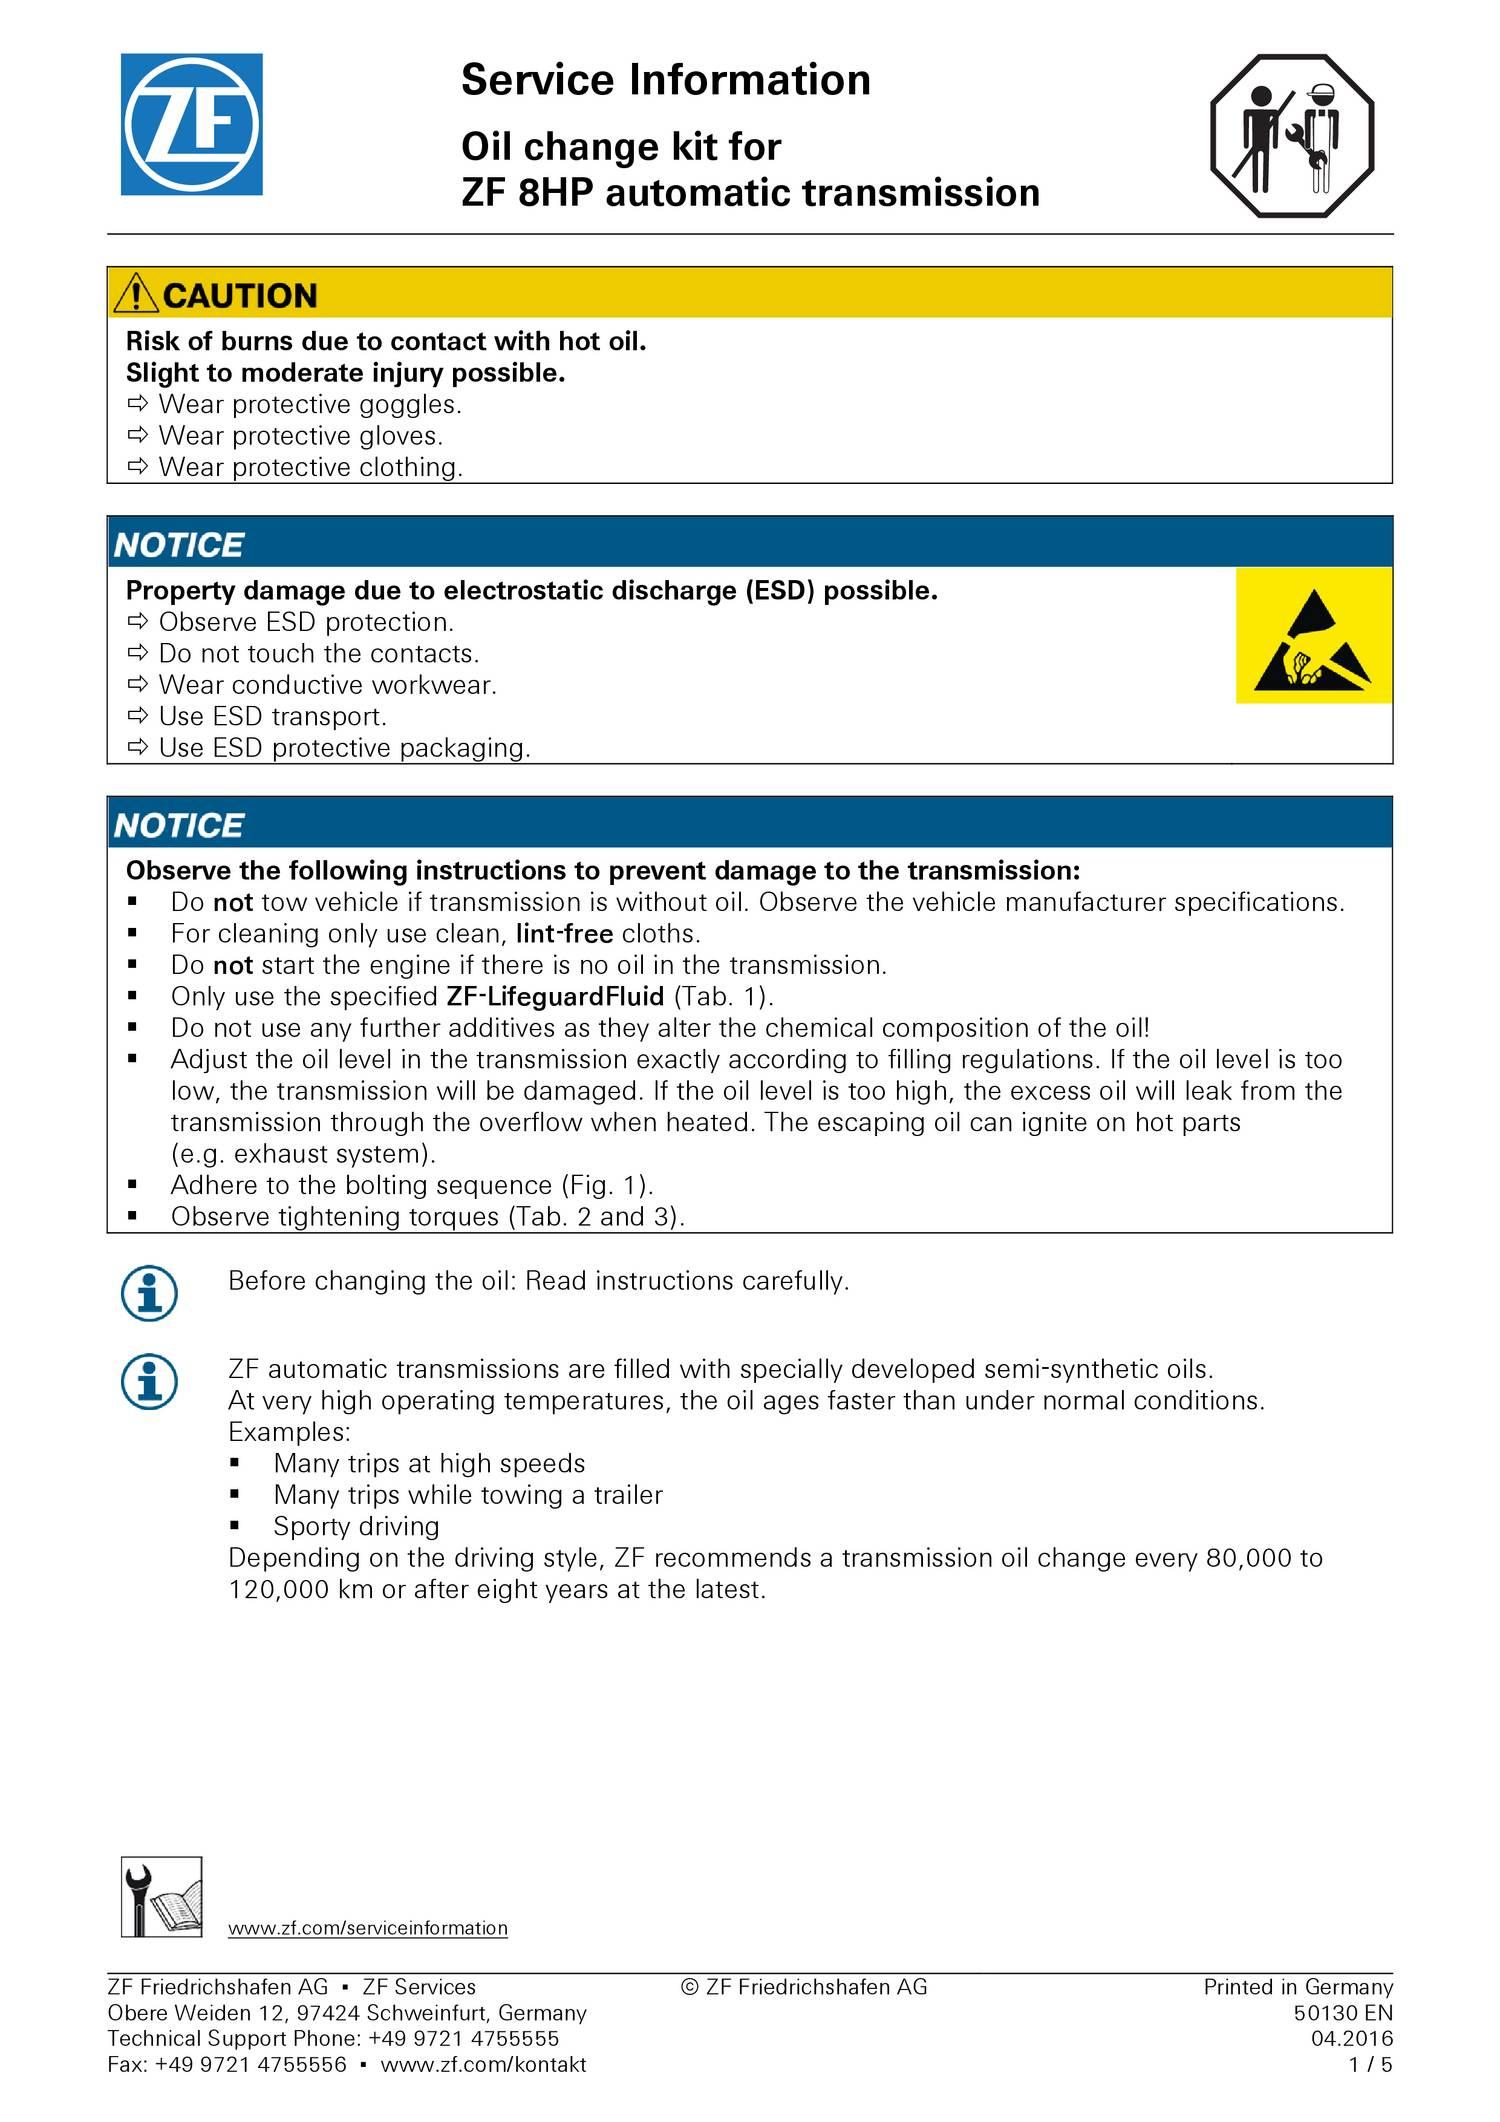 ZF_SI_Oelwechselkit_8HP_50130_EN pdf | DocDroid